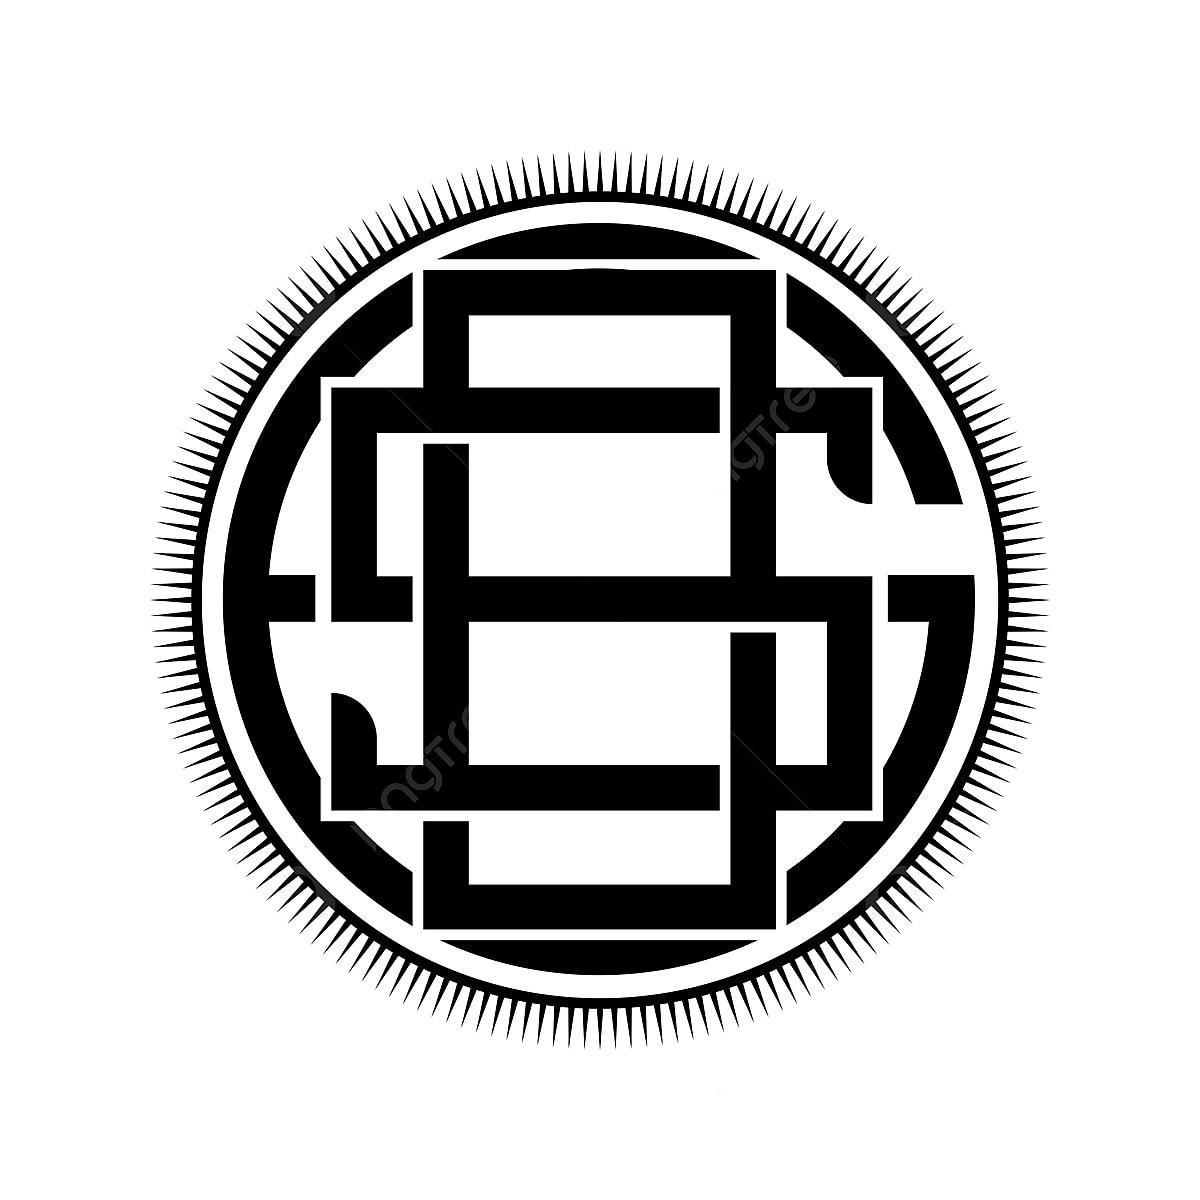 Monogram Design Initial Logo Sos Logo Vector Eps 10 Template For Free Download On Pngtree